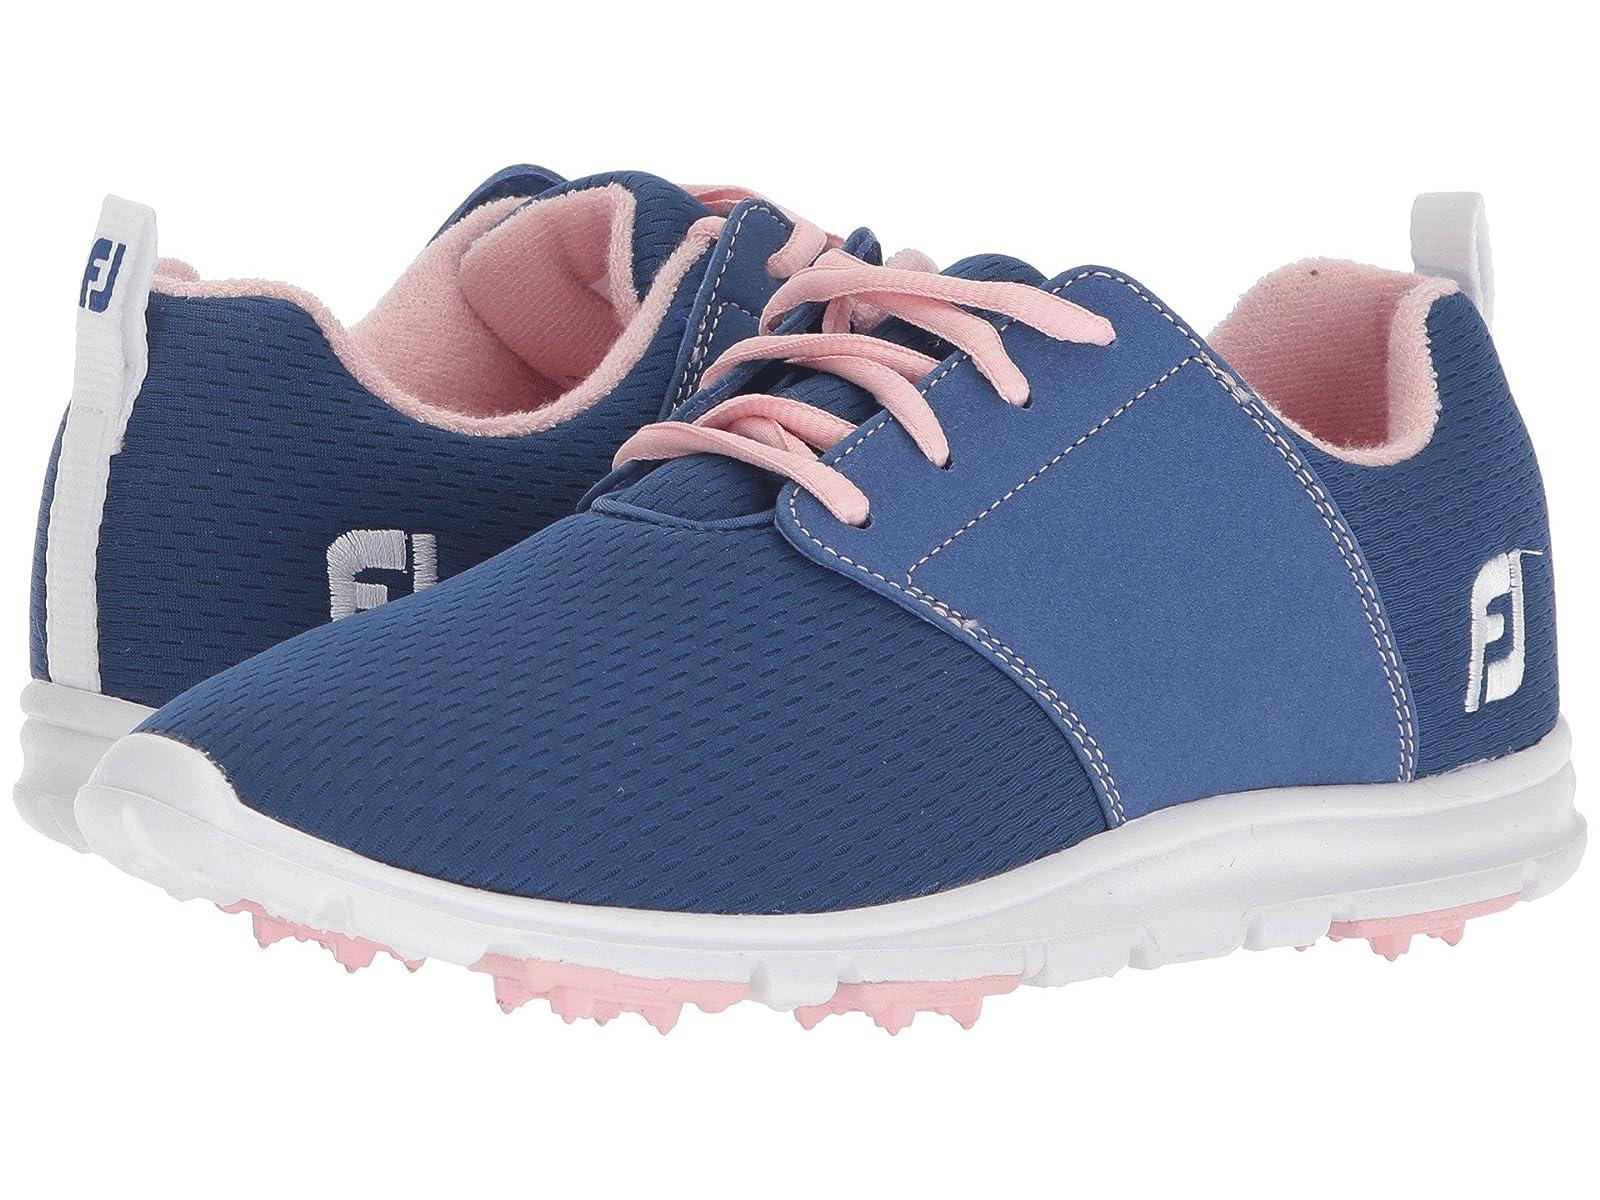 FootJoy Enjoy Spikeless Mesh SaddleAtmospheric grades have affordable shoes